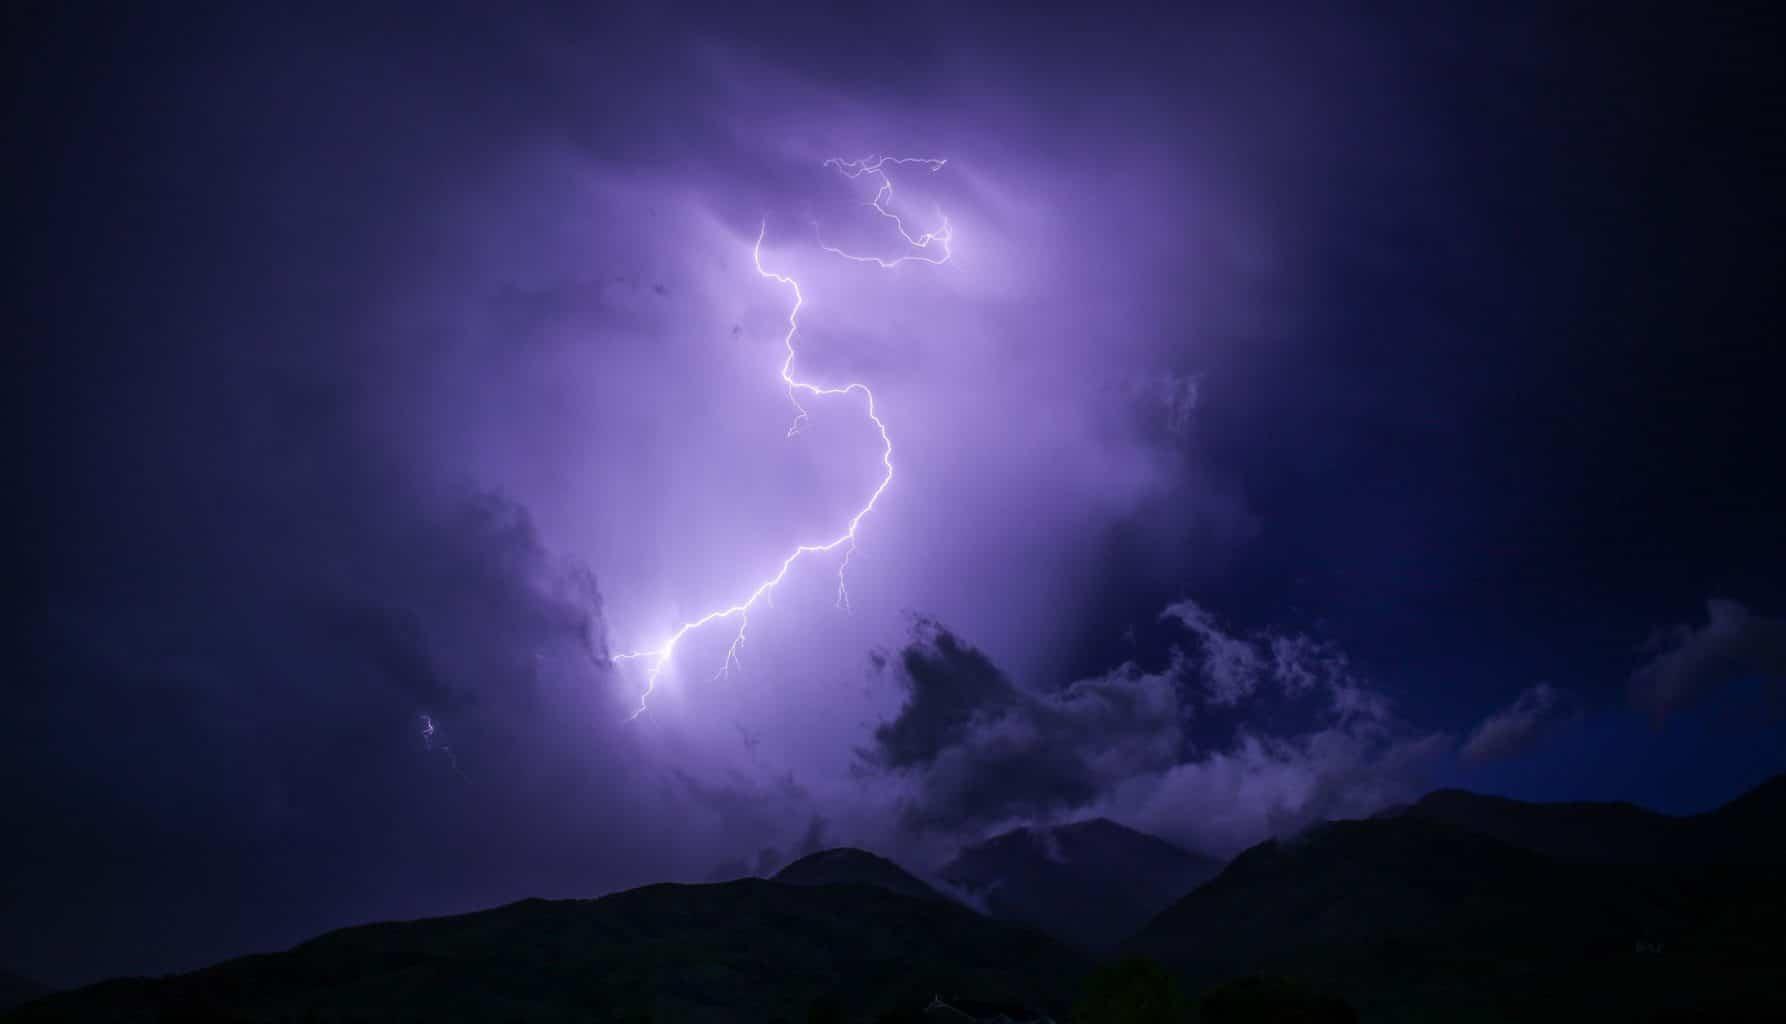 Lightning Photo by Layne Lawson